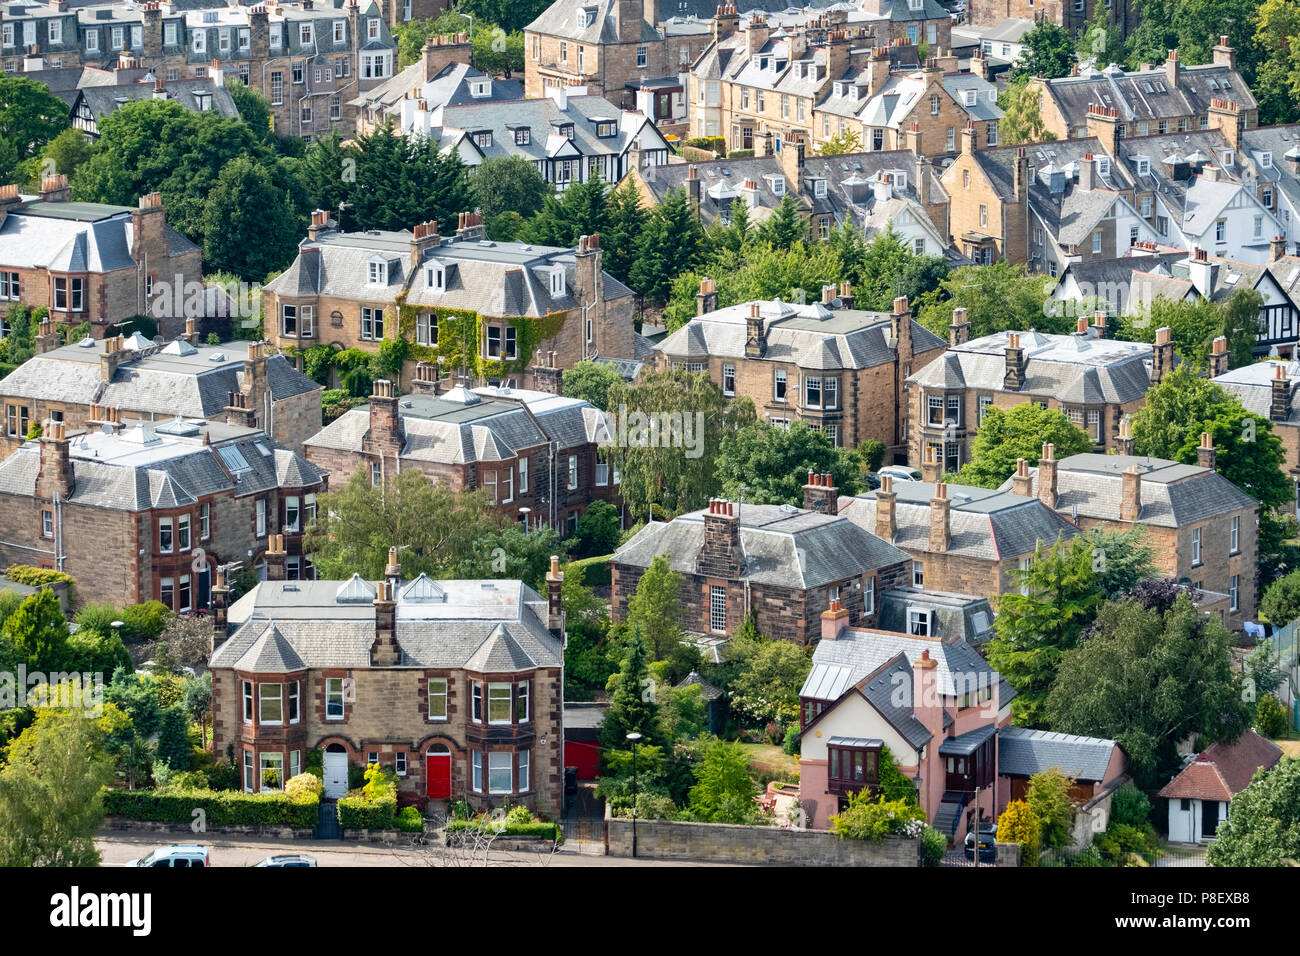 Large  villas in upmarket Morningside district of Edinburgh, Scotland, UK - Stock Image